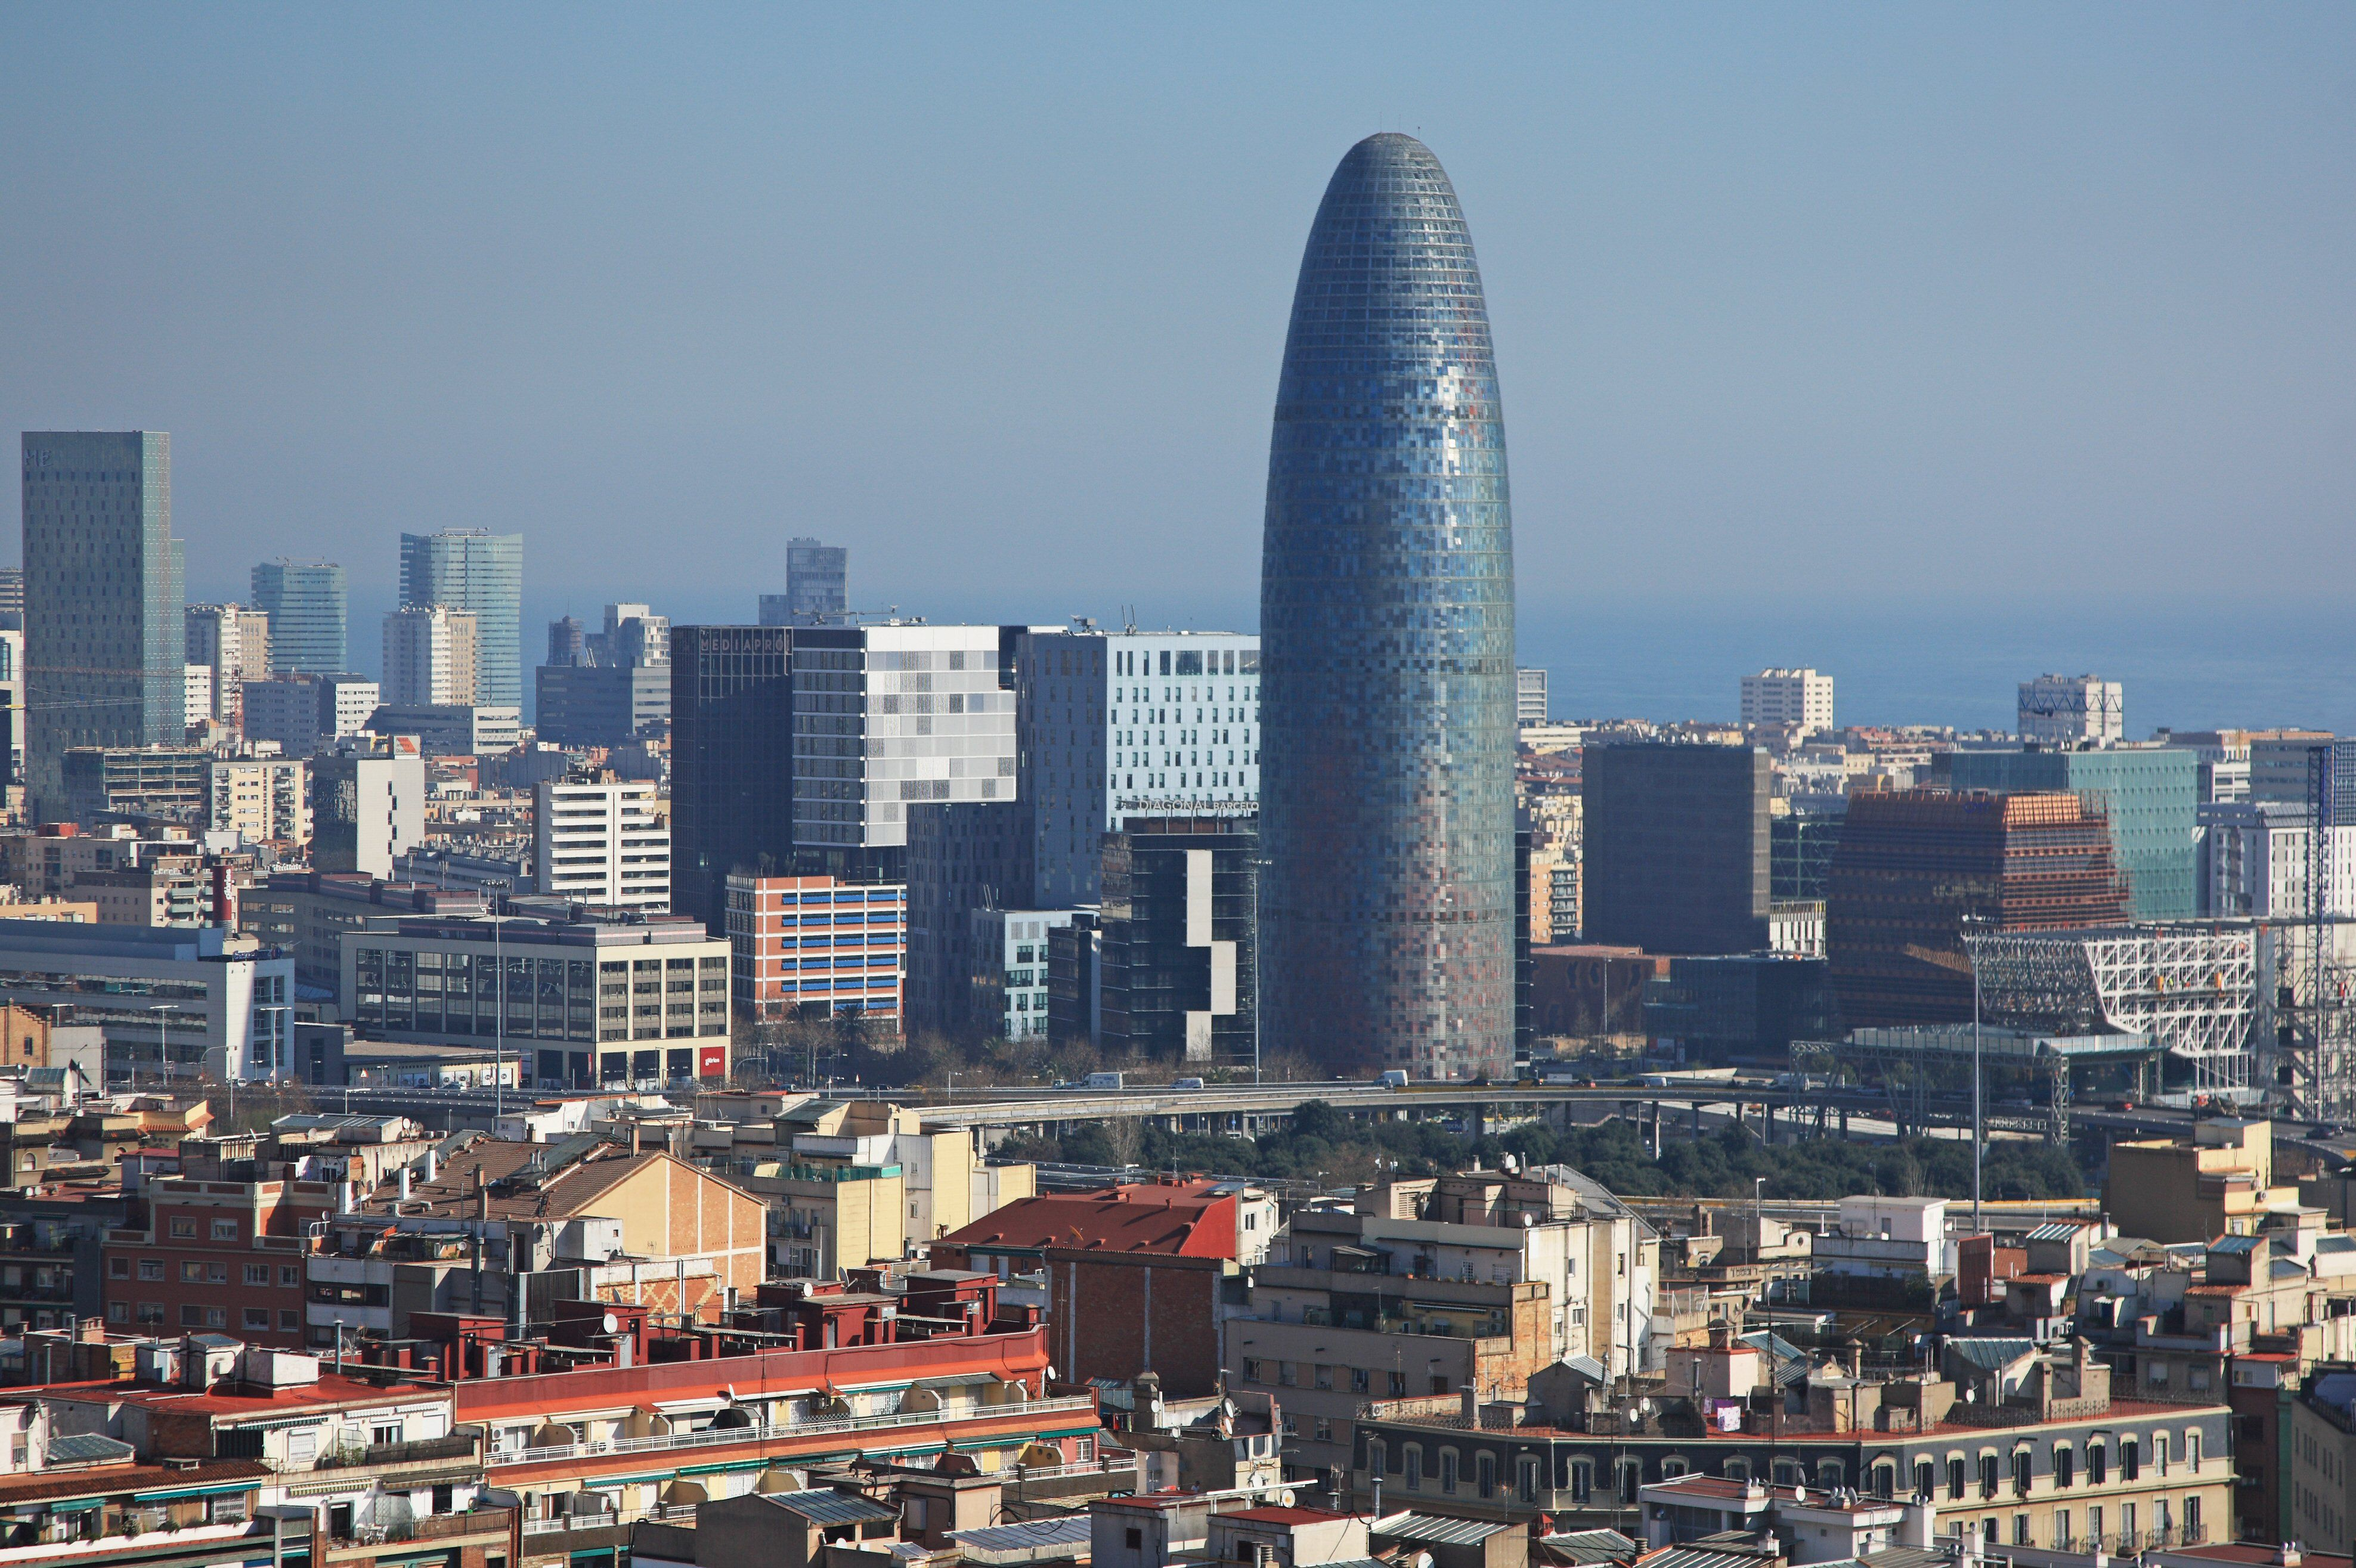 city scene with large missile-like skyscraper rising amongst rectangular buildings